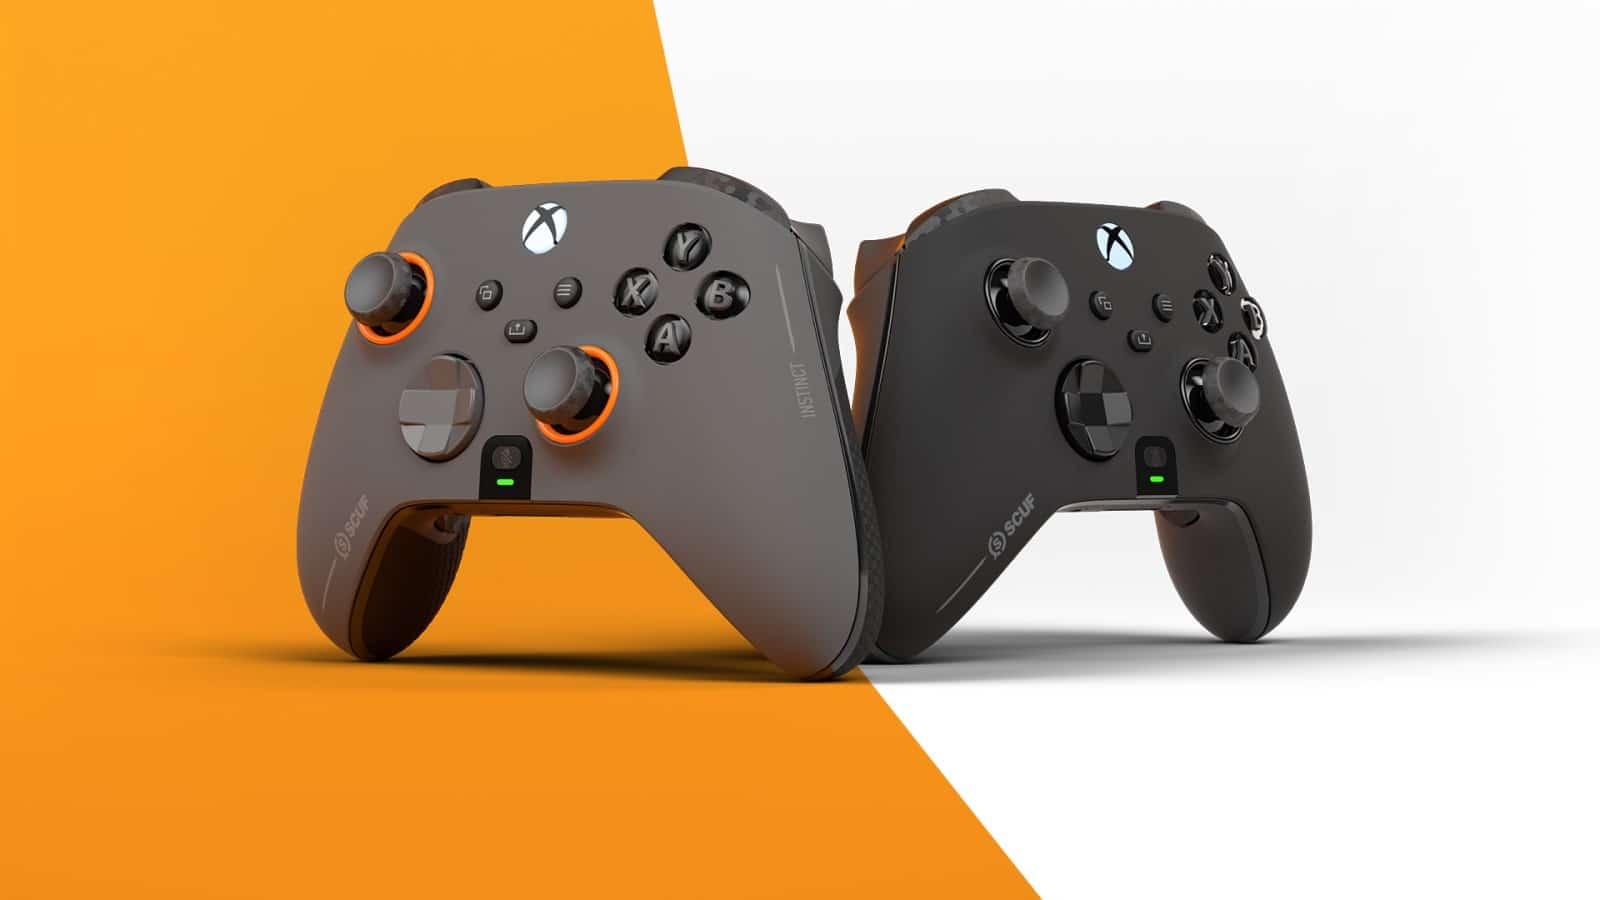 scuf instinct and instinct pro custom xbox series x controllers